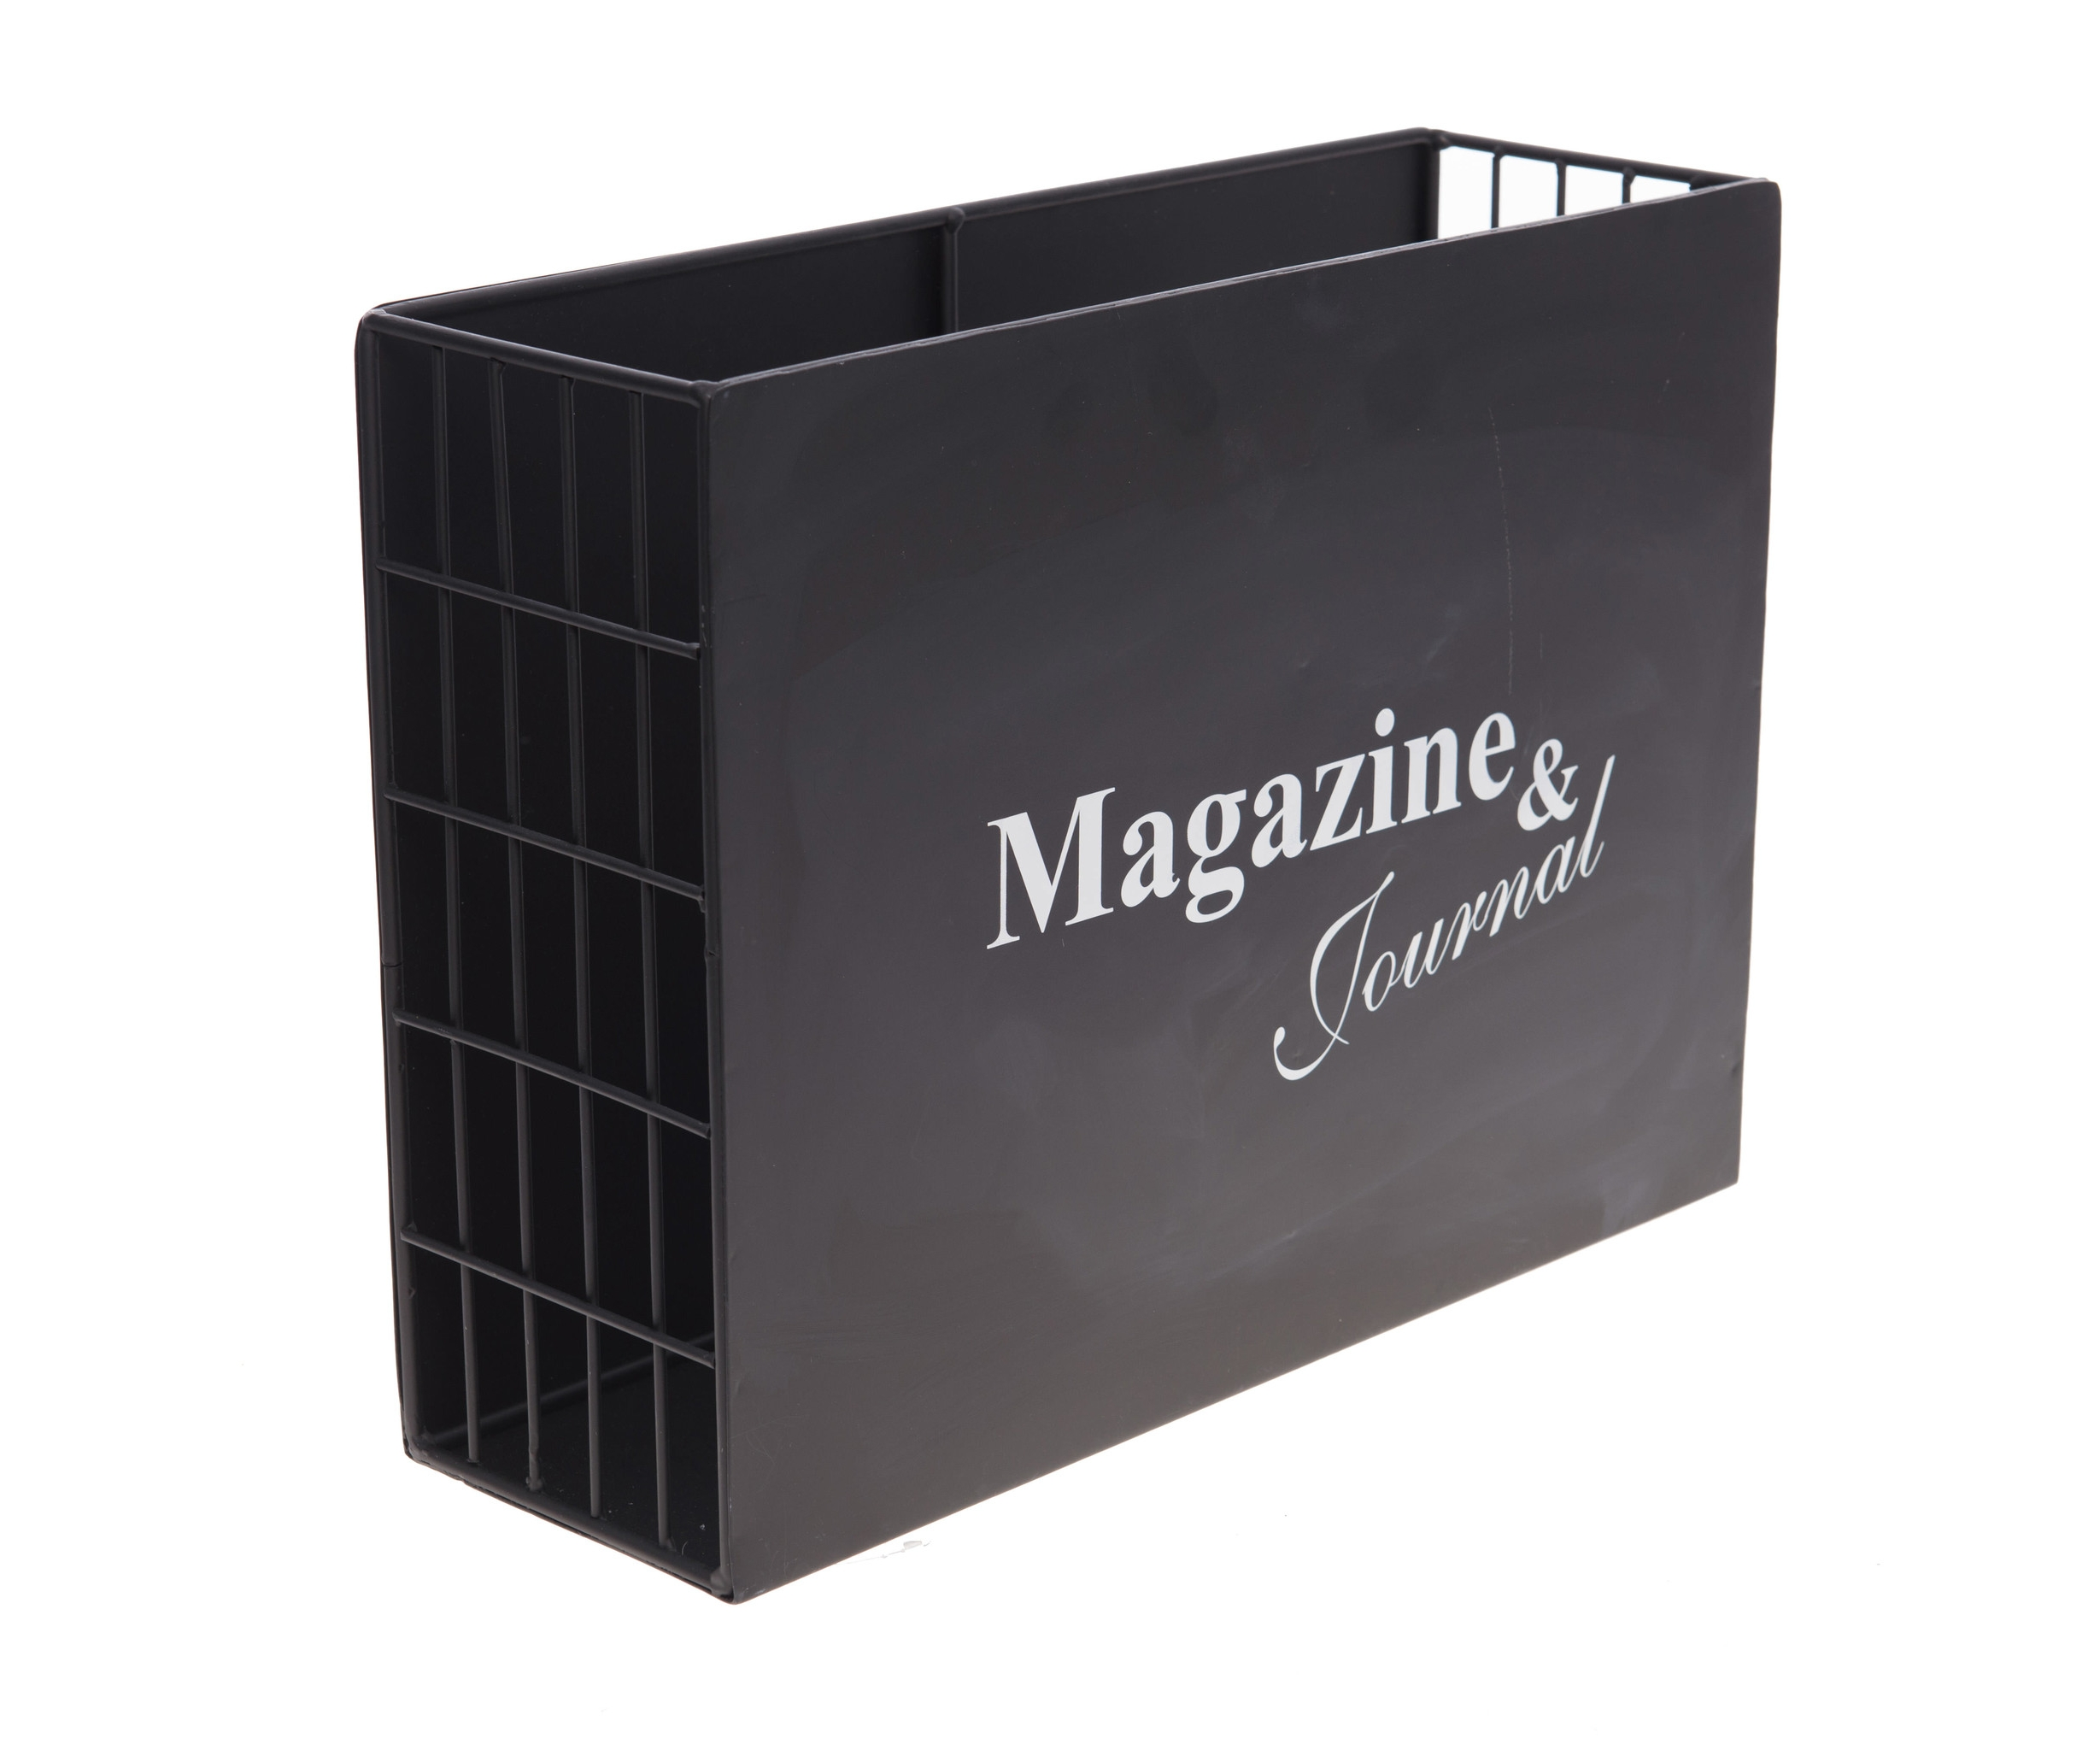 Журнальница Solt-Sainte-MarieАксессуары для хранения бумаги и канцелярии<br><br><br>Material: Металл<br>Length см: None<br>Width см: 38<br>Depth см: 12<br>Height см: 28